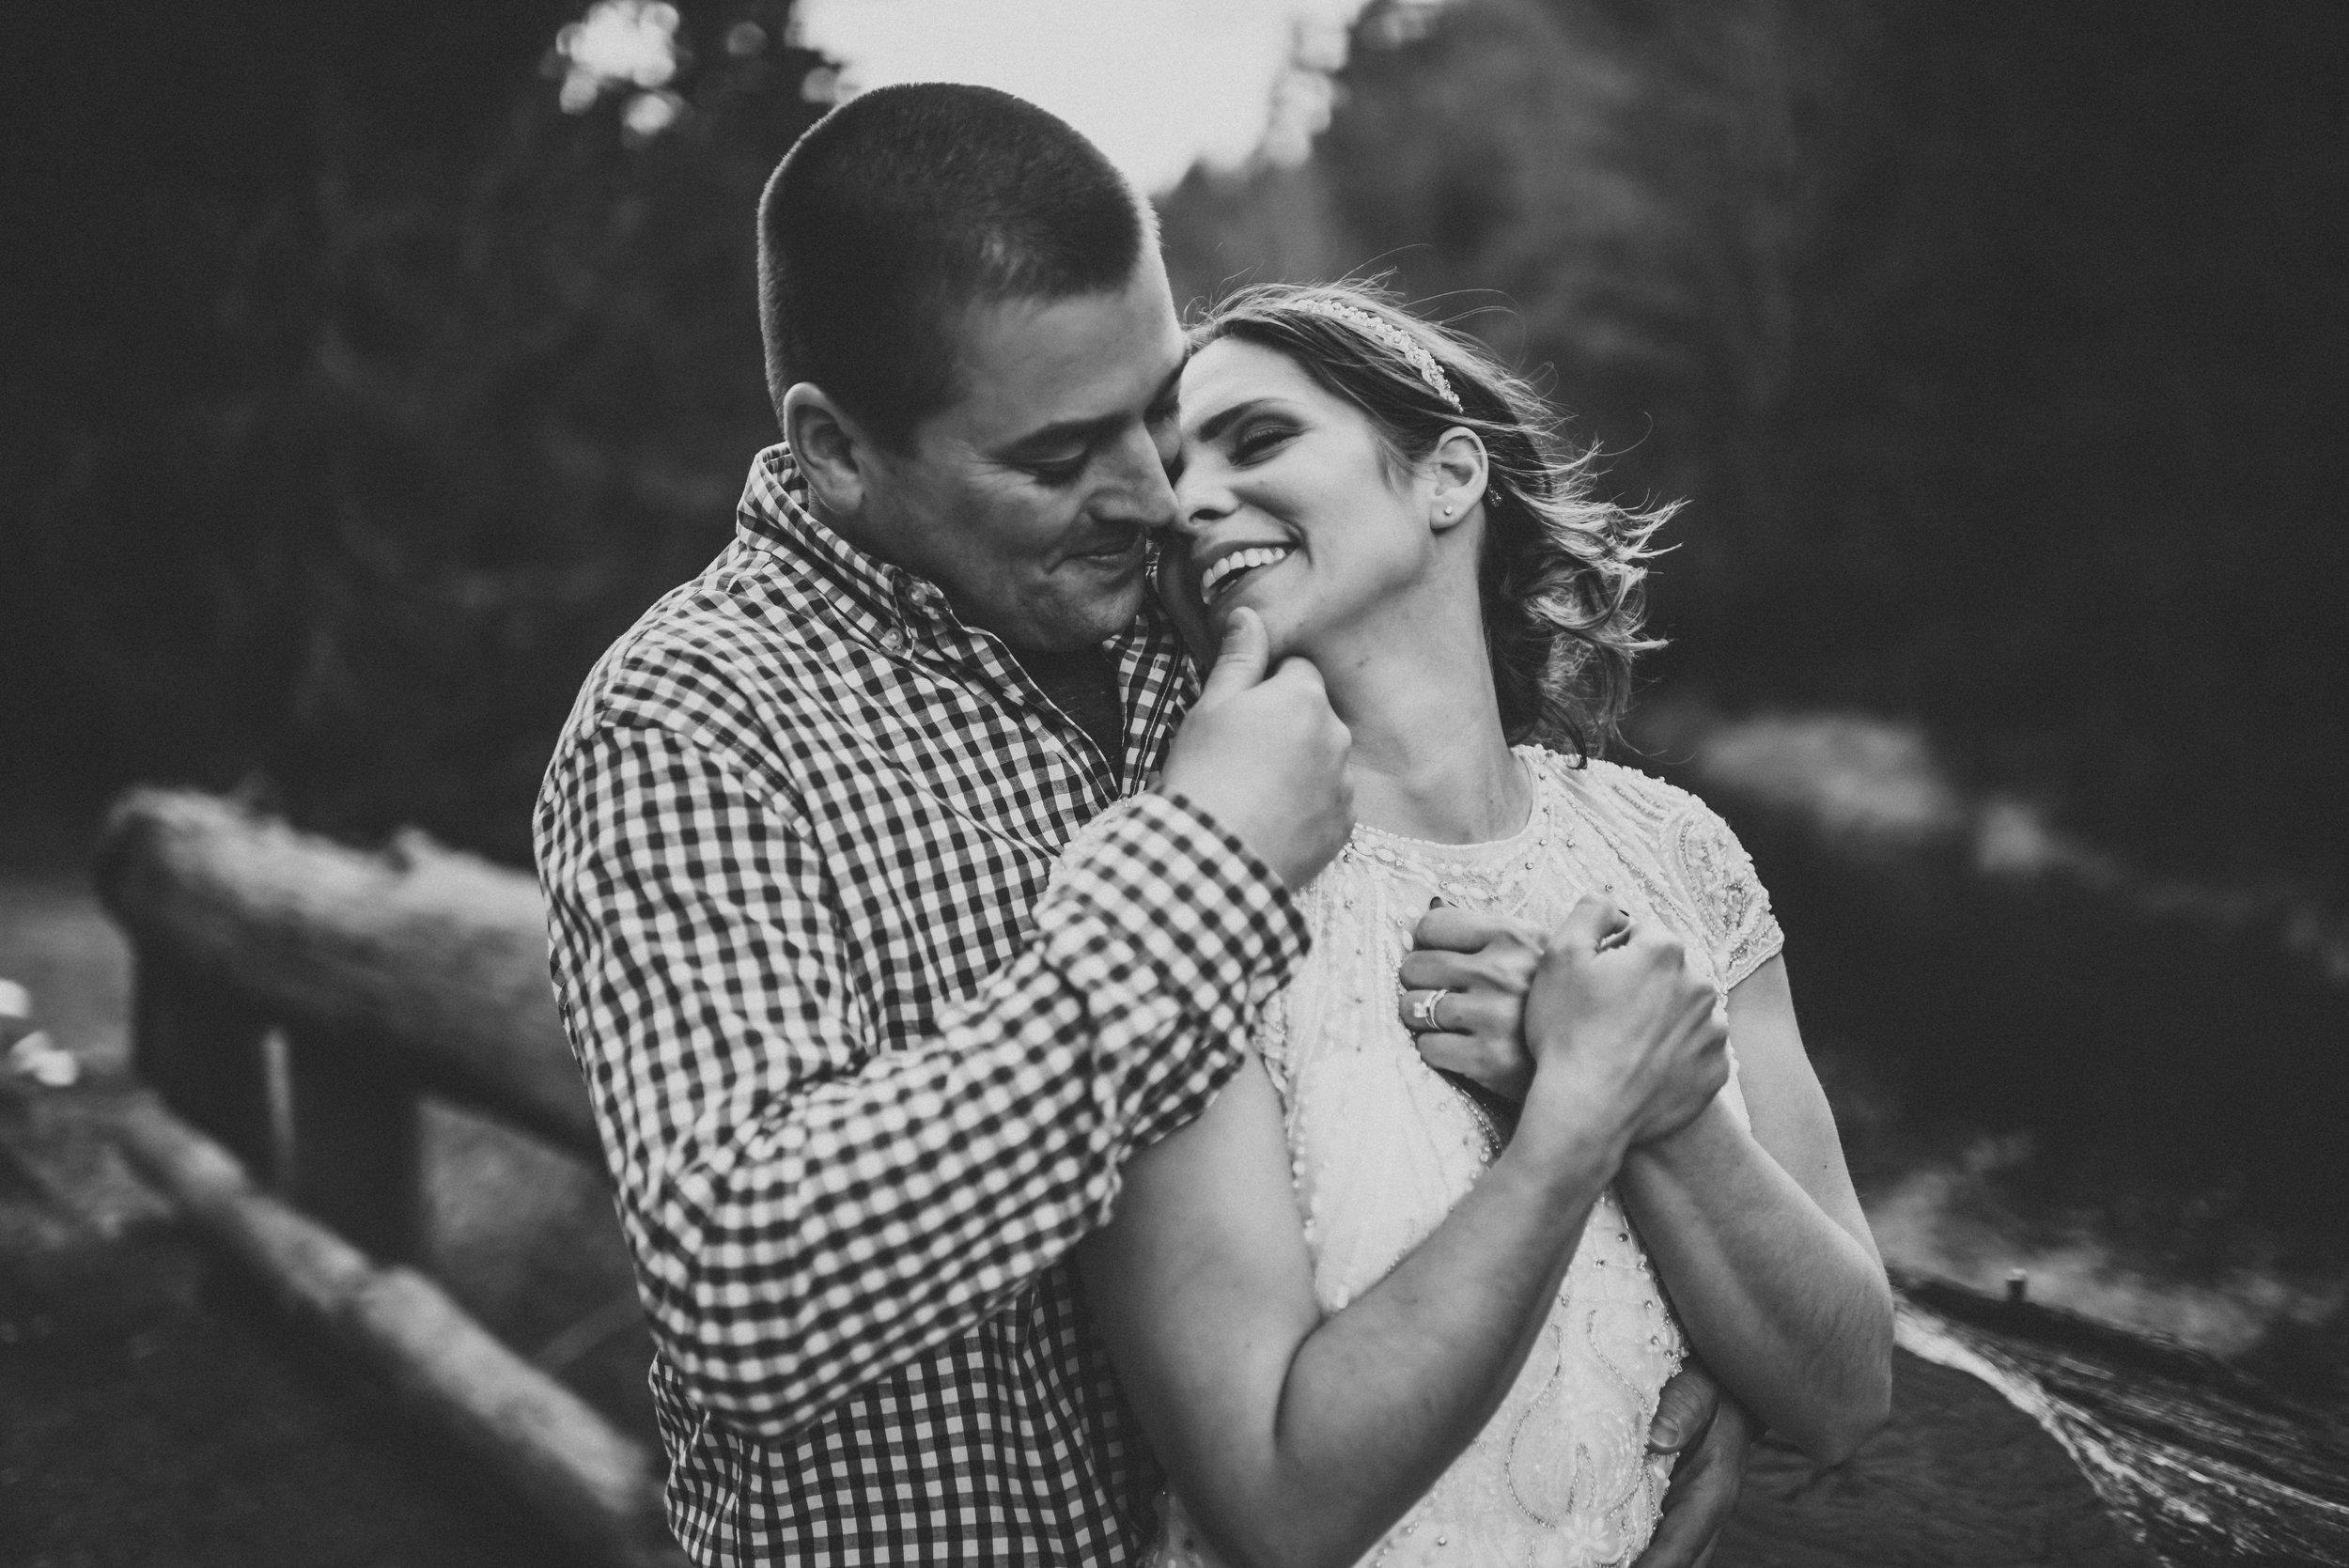 Sarah & Shawn - Elopement at Hawk Falls | Hickory Run State Park,White Haven PA